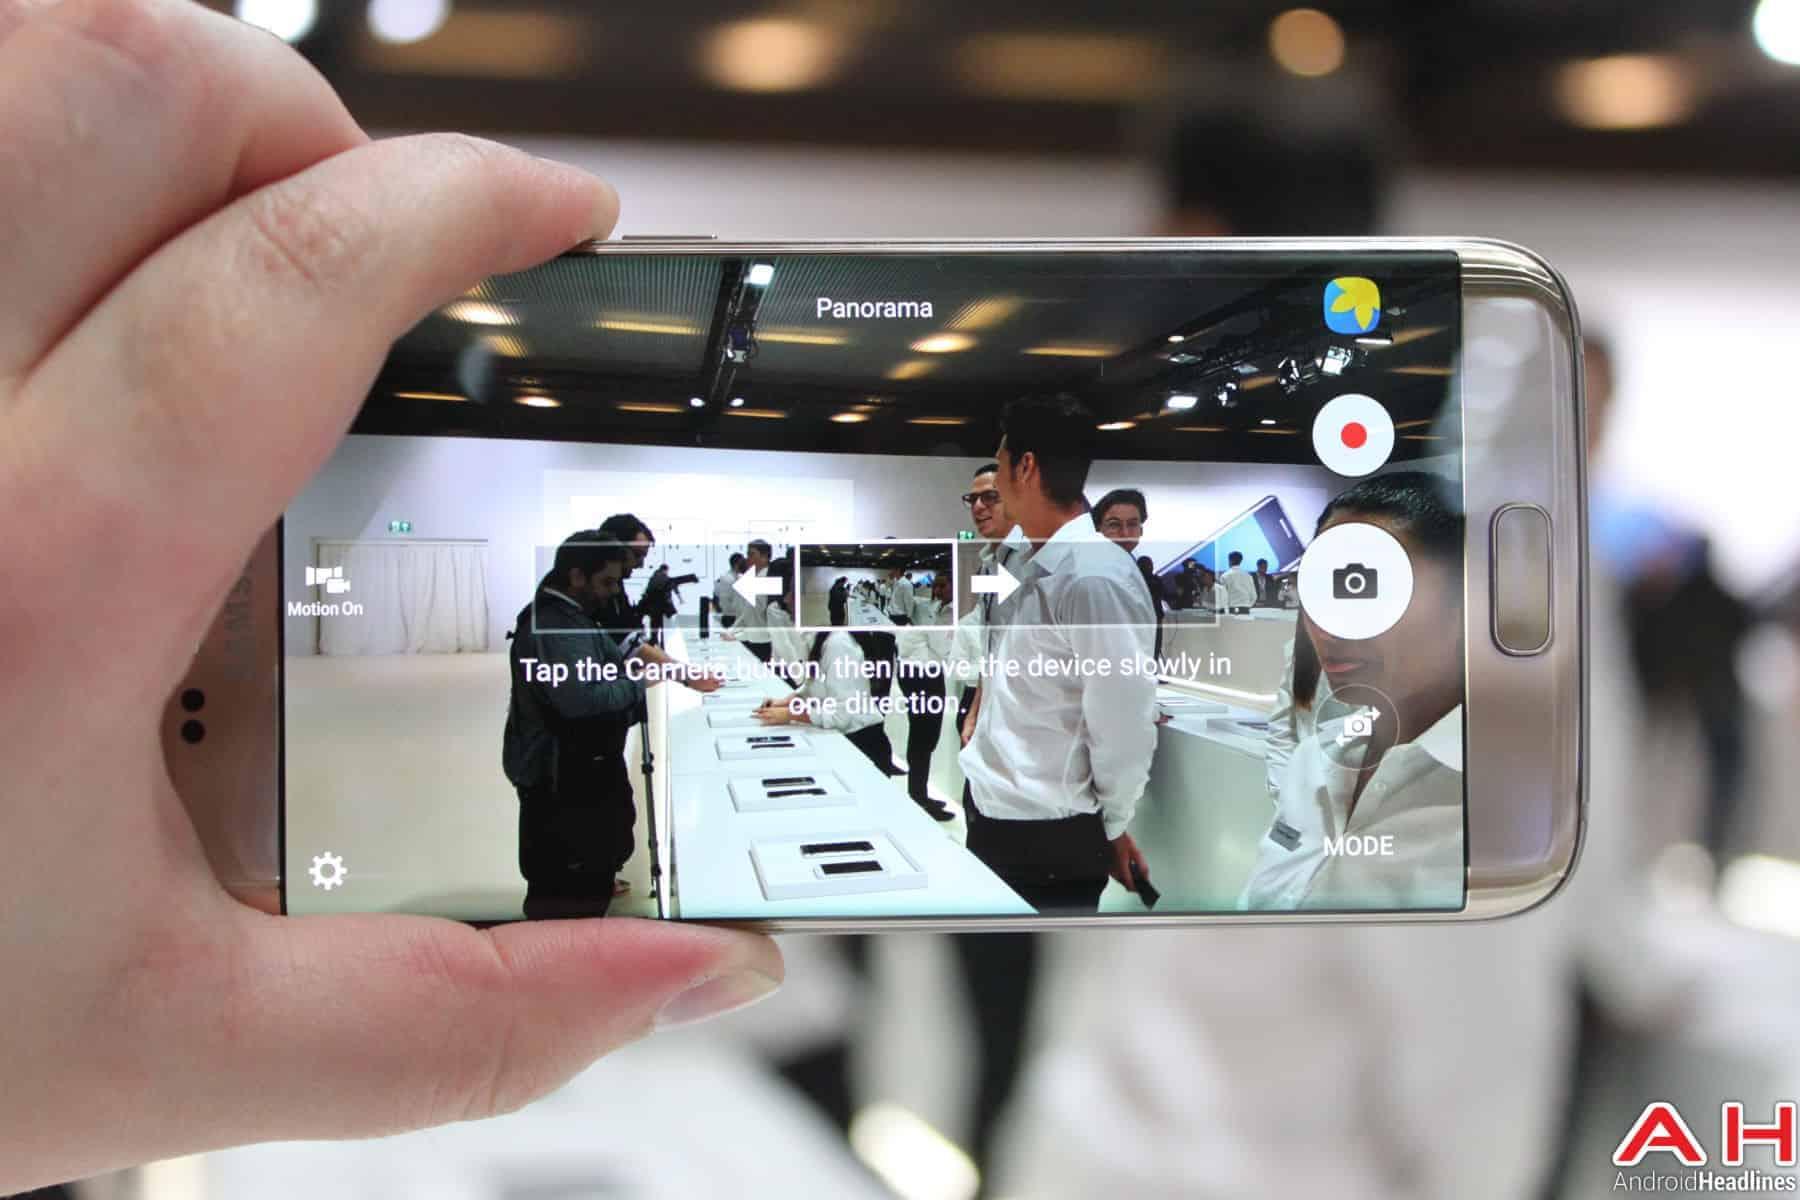 Samsung Galaxy S7 Edge Camera UI AH 5